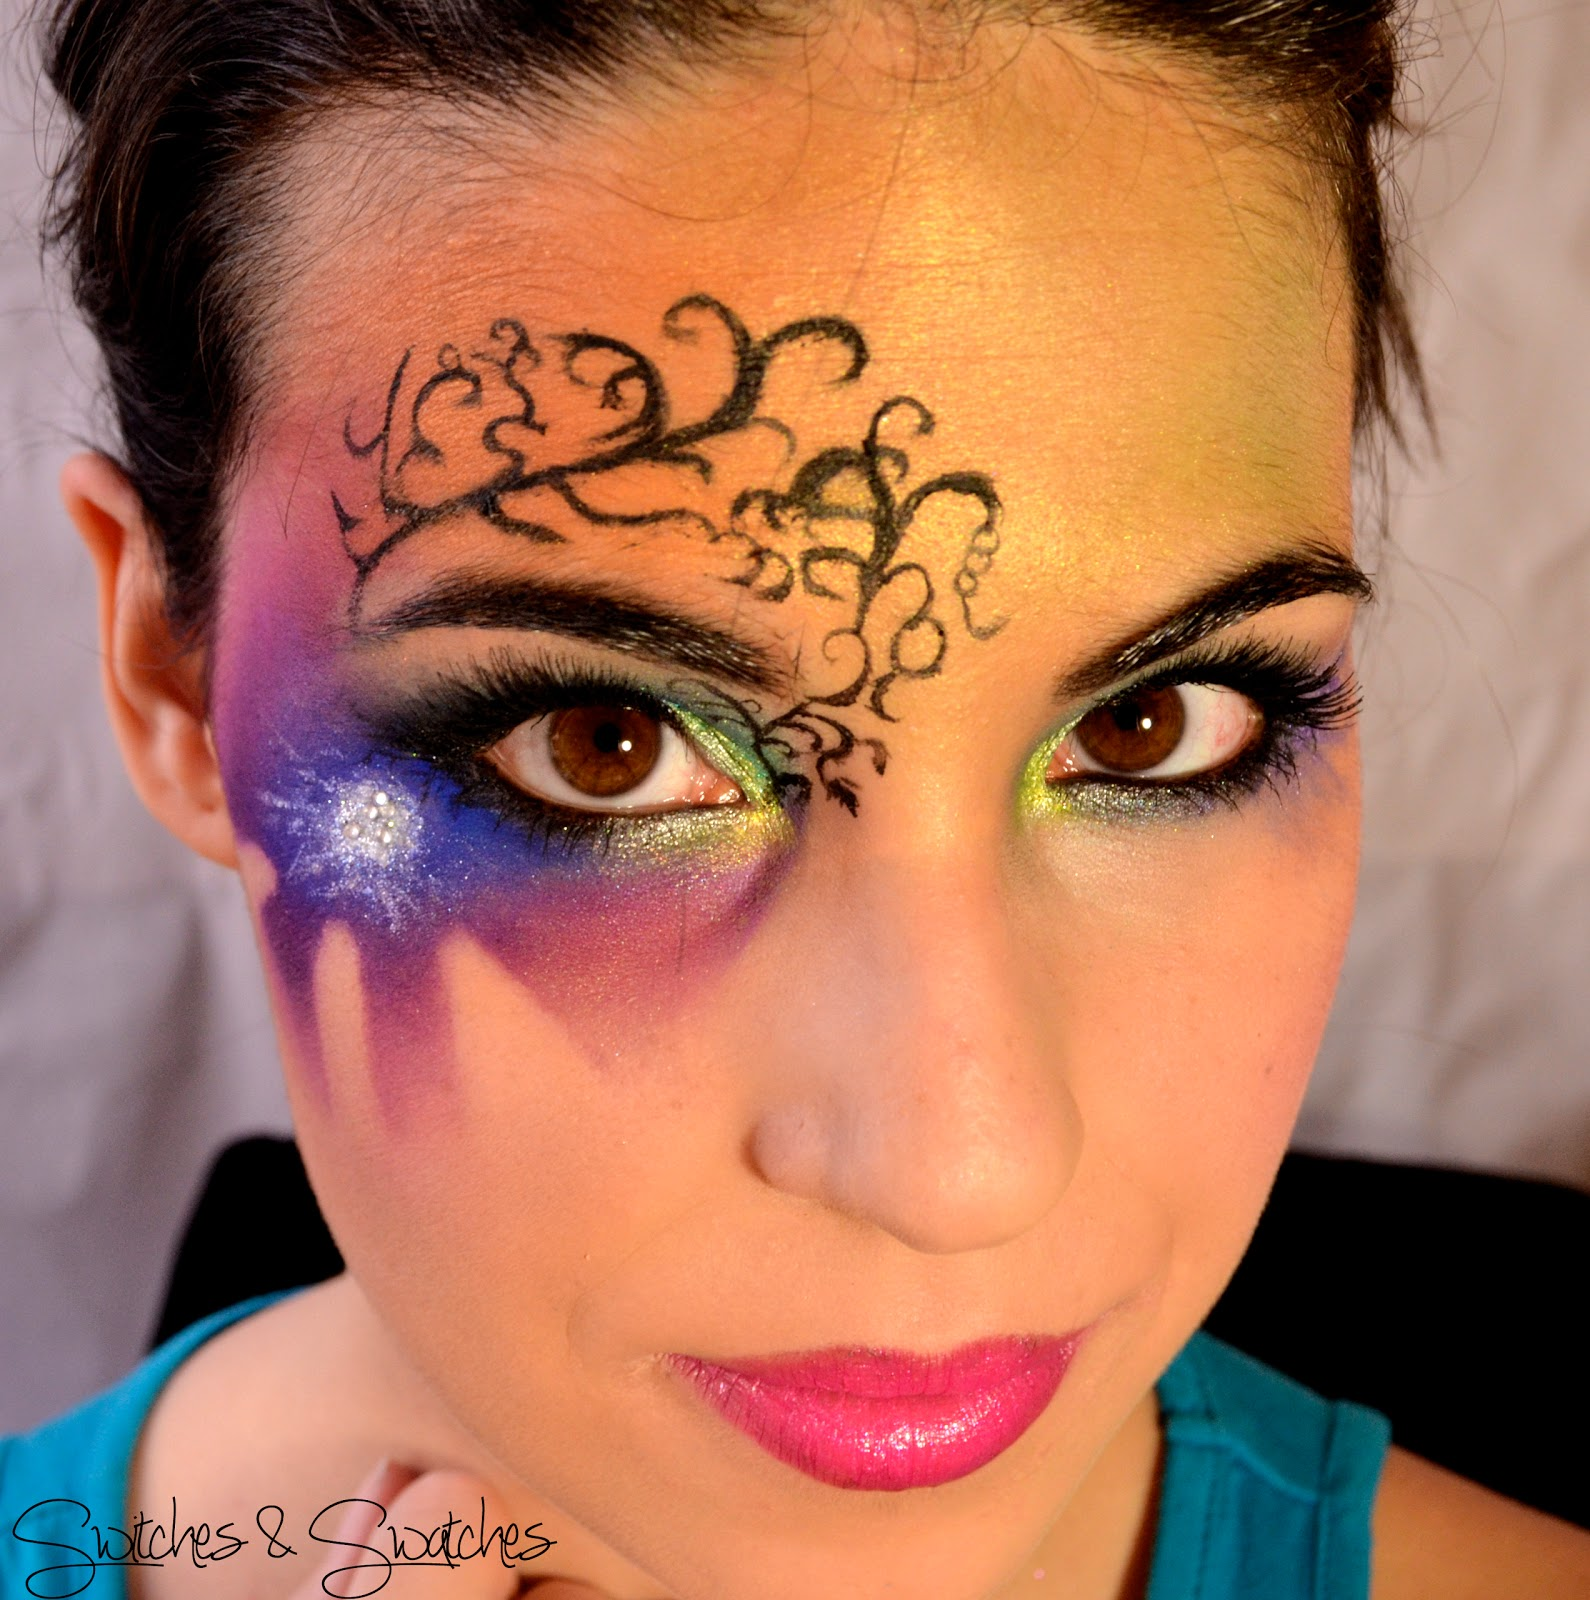 1000 images about maquillaje de fantas a makeup fantasy on pinterest maquillaje makeup and. Black Bedroom Furniture Sets. Home Design Ideas